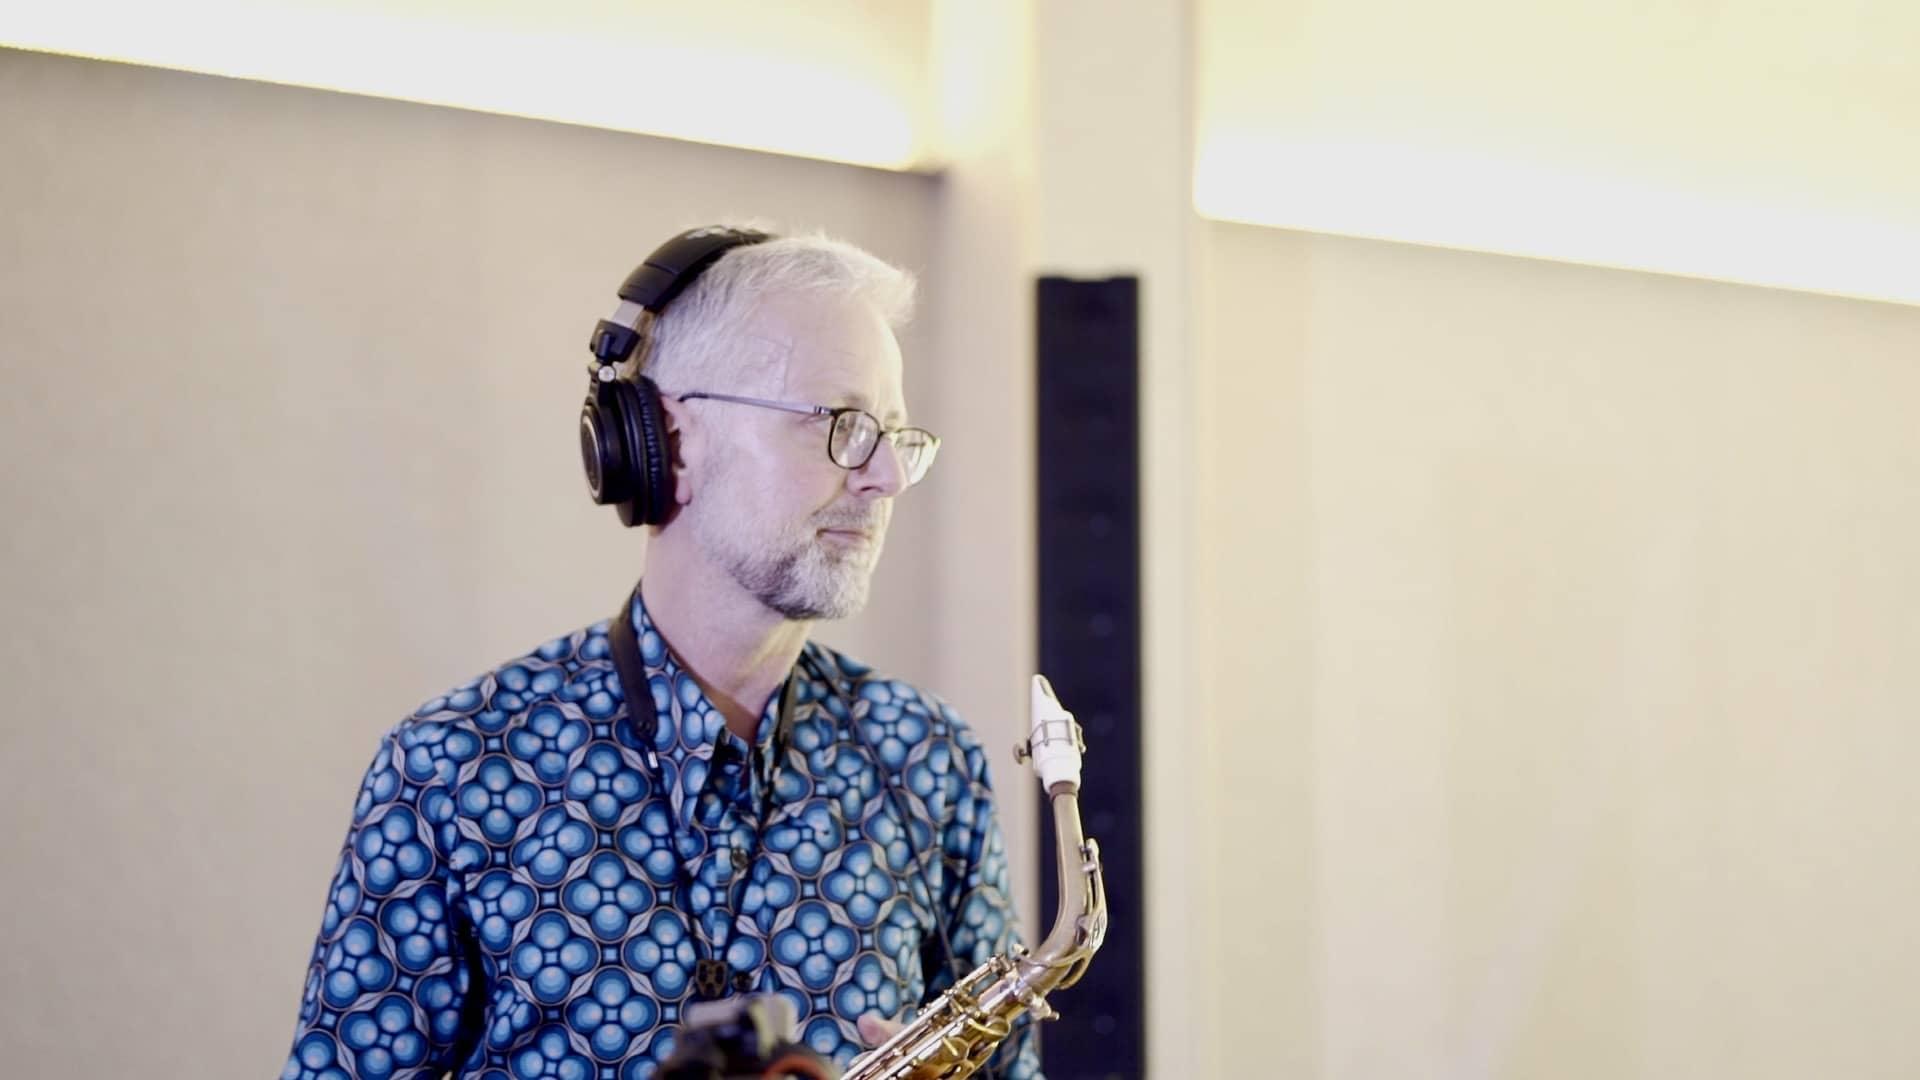 Ulli juenemann saxophonist